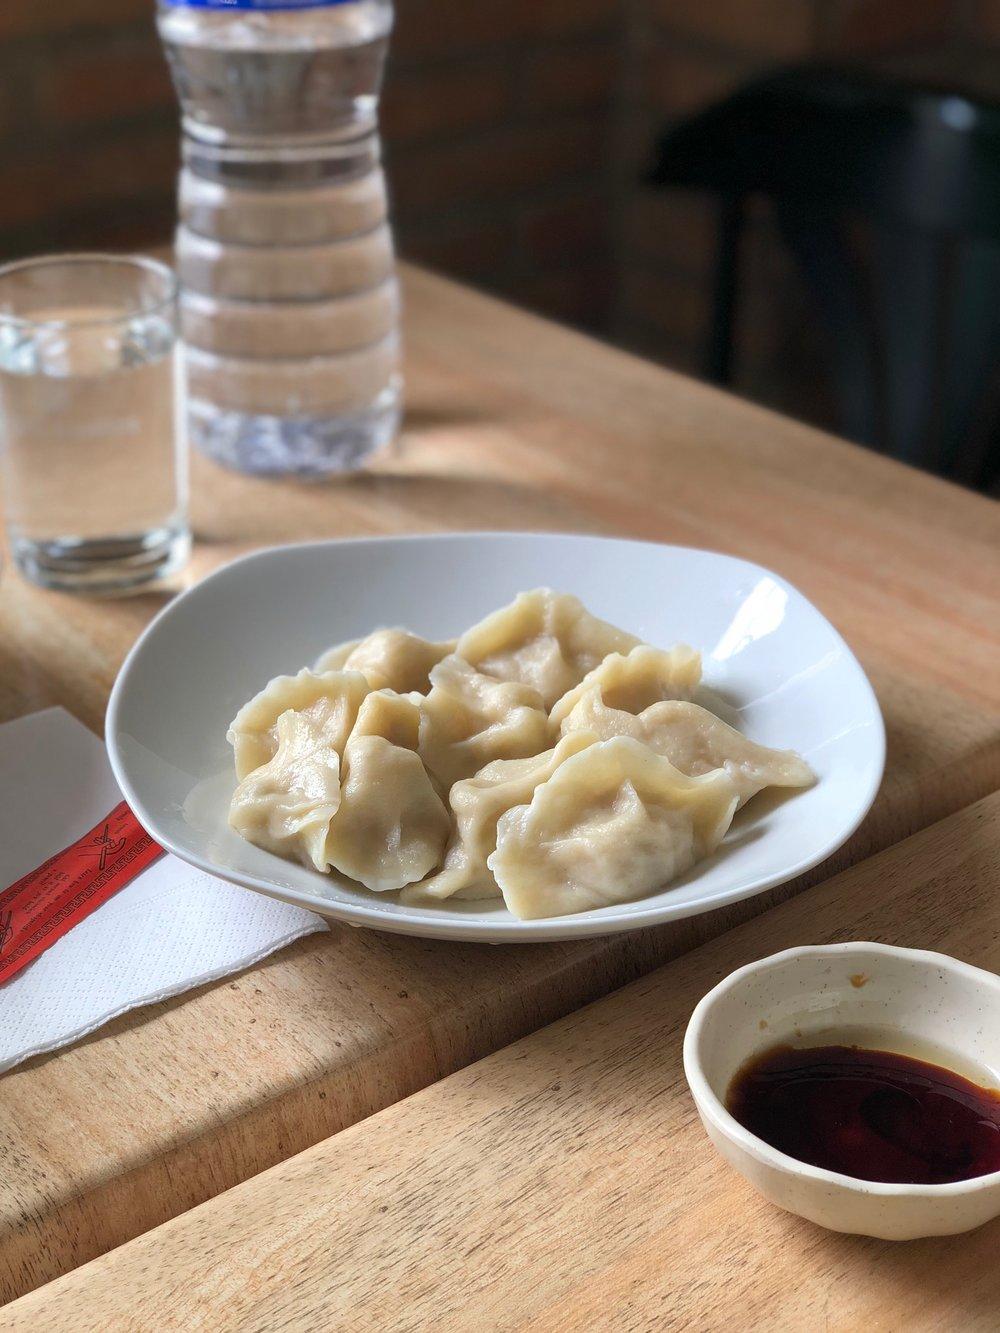 Dumplings (水餃, empanadillas)